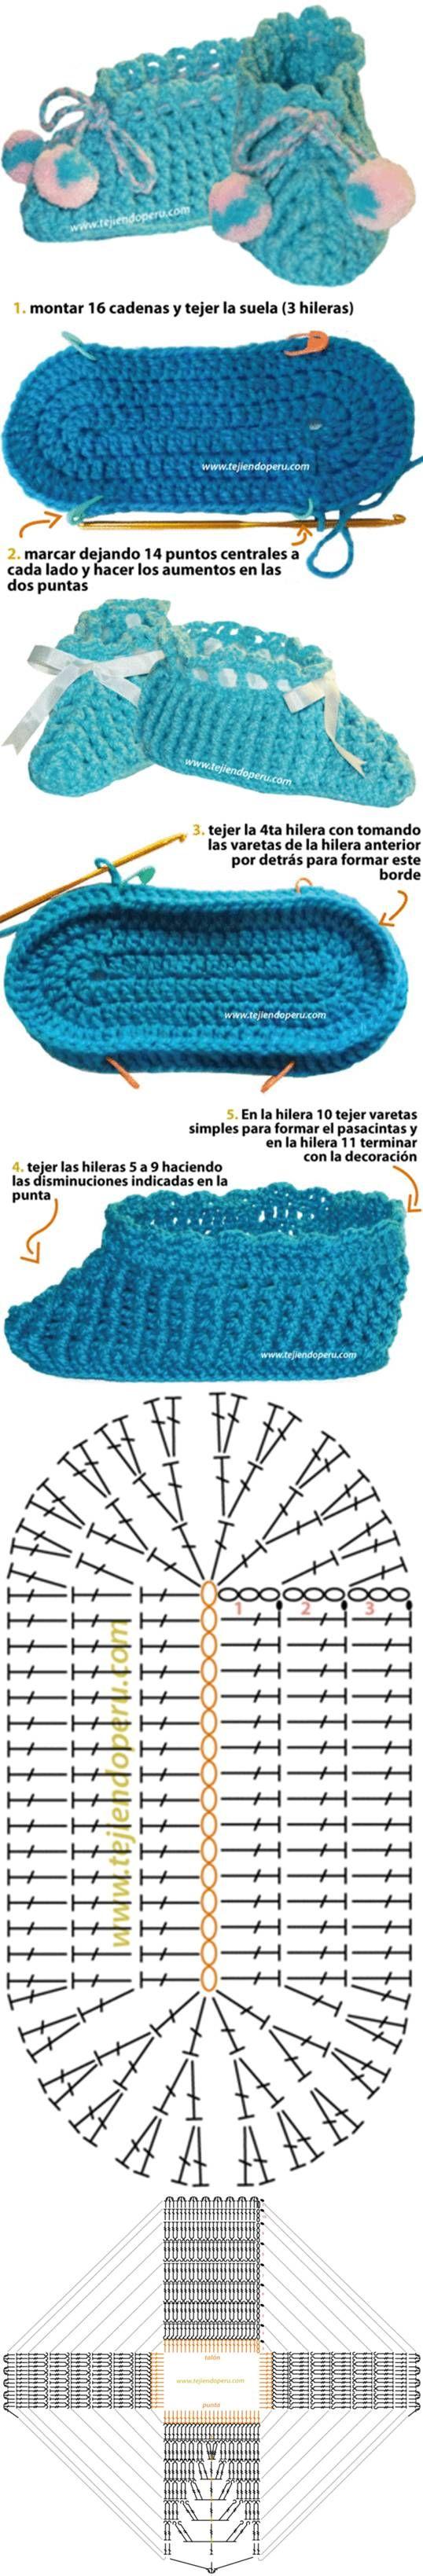 DIY Crochet Crocodile Booties Pattern